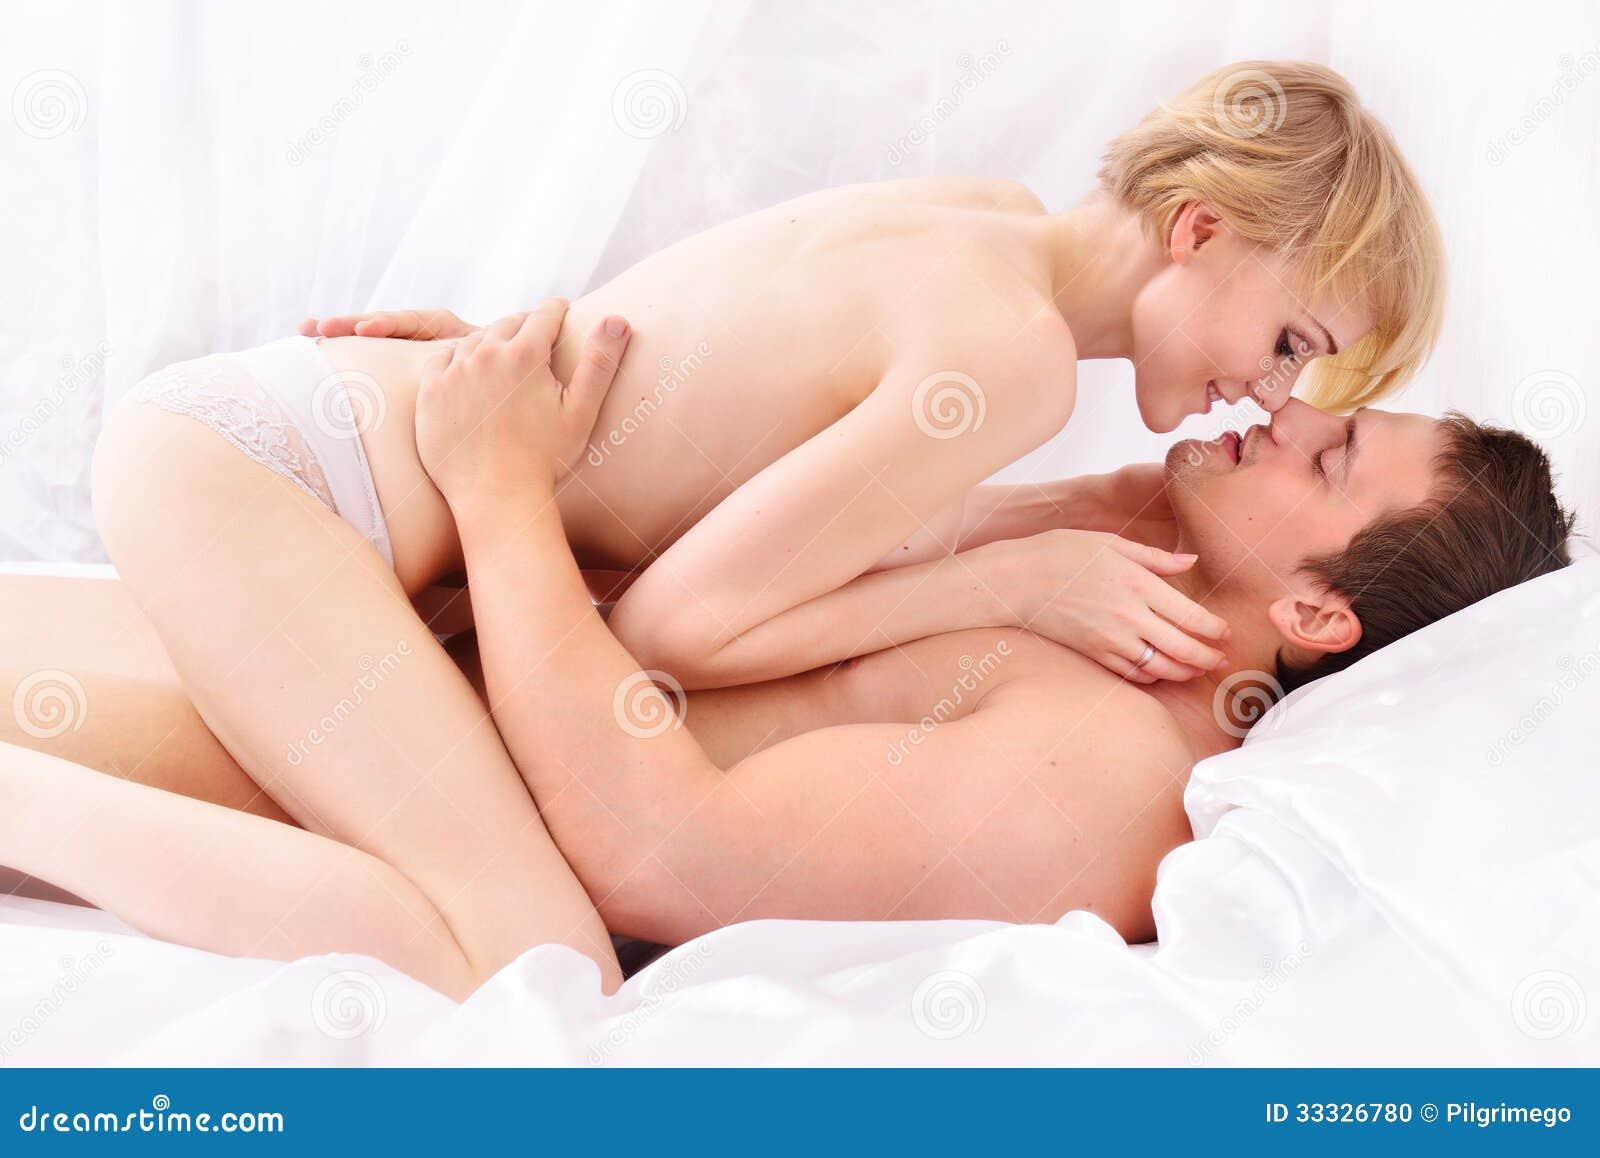 bi paar erotik erzählung